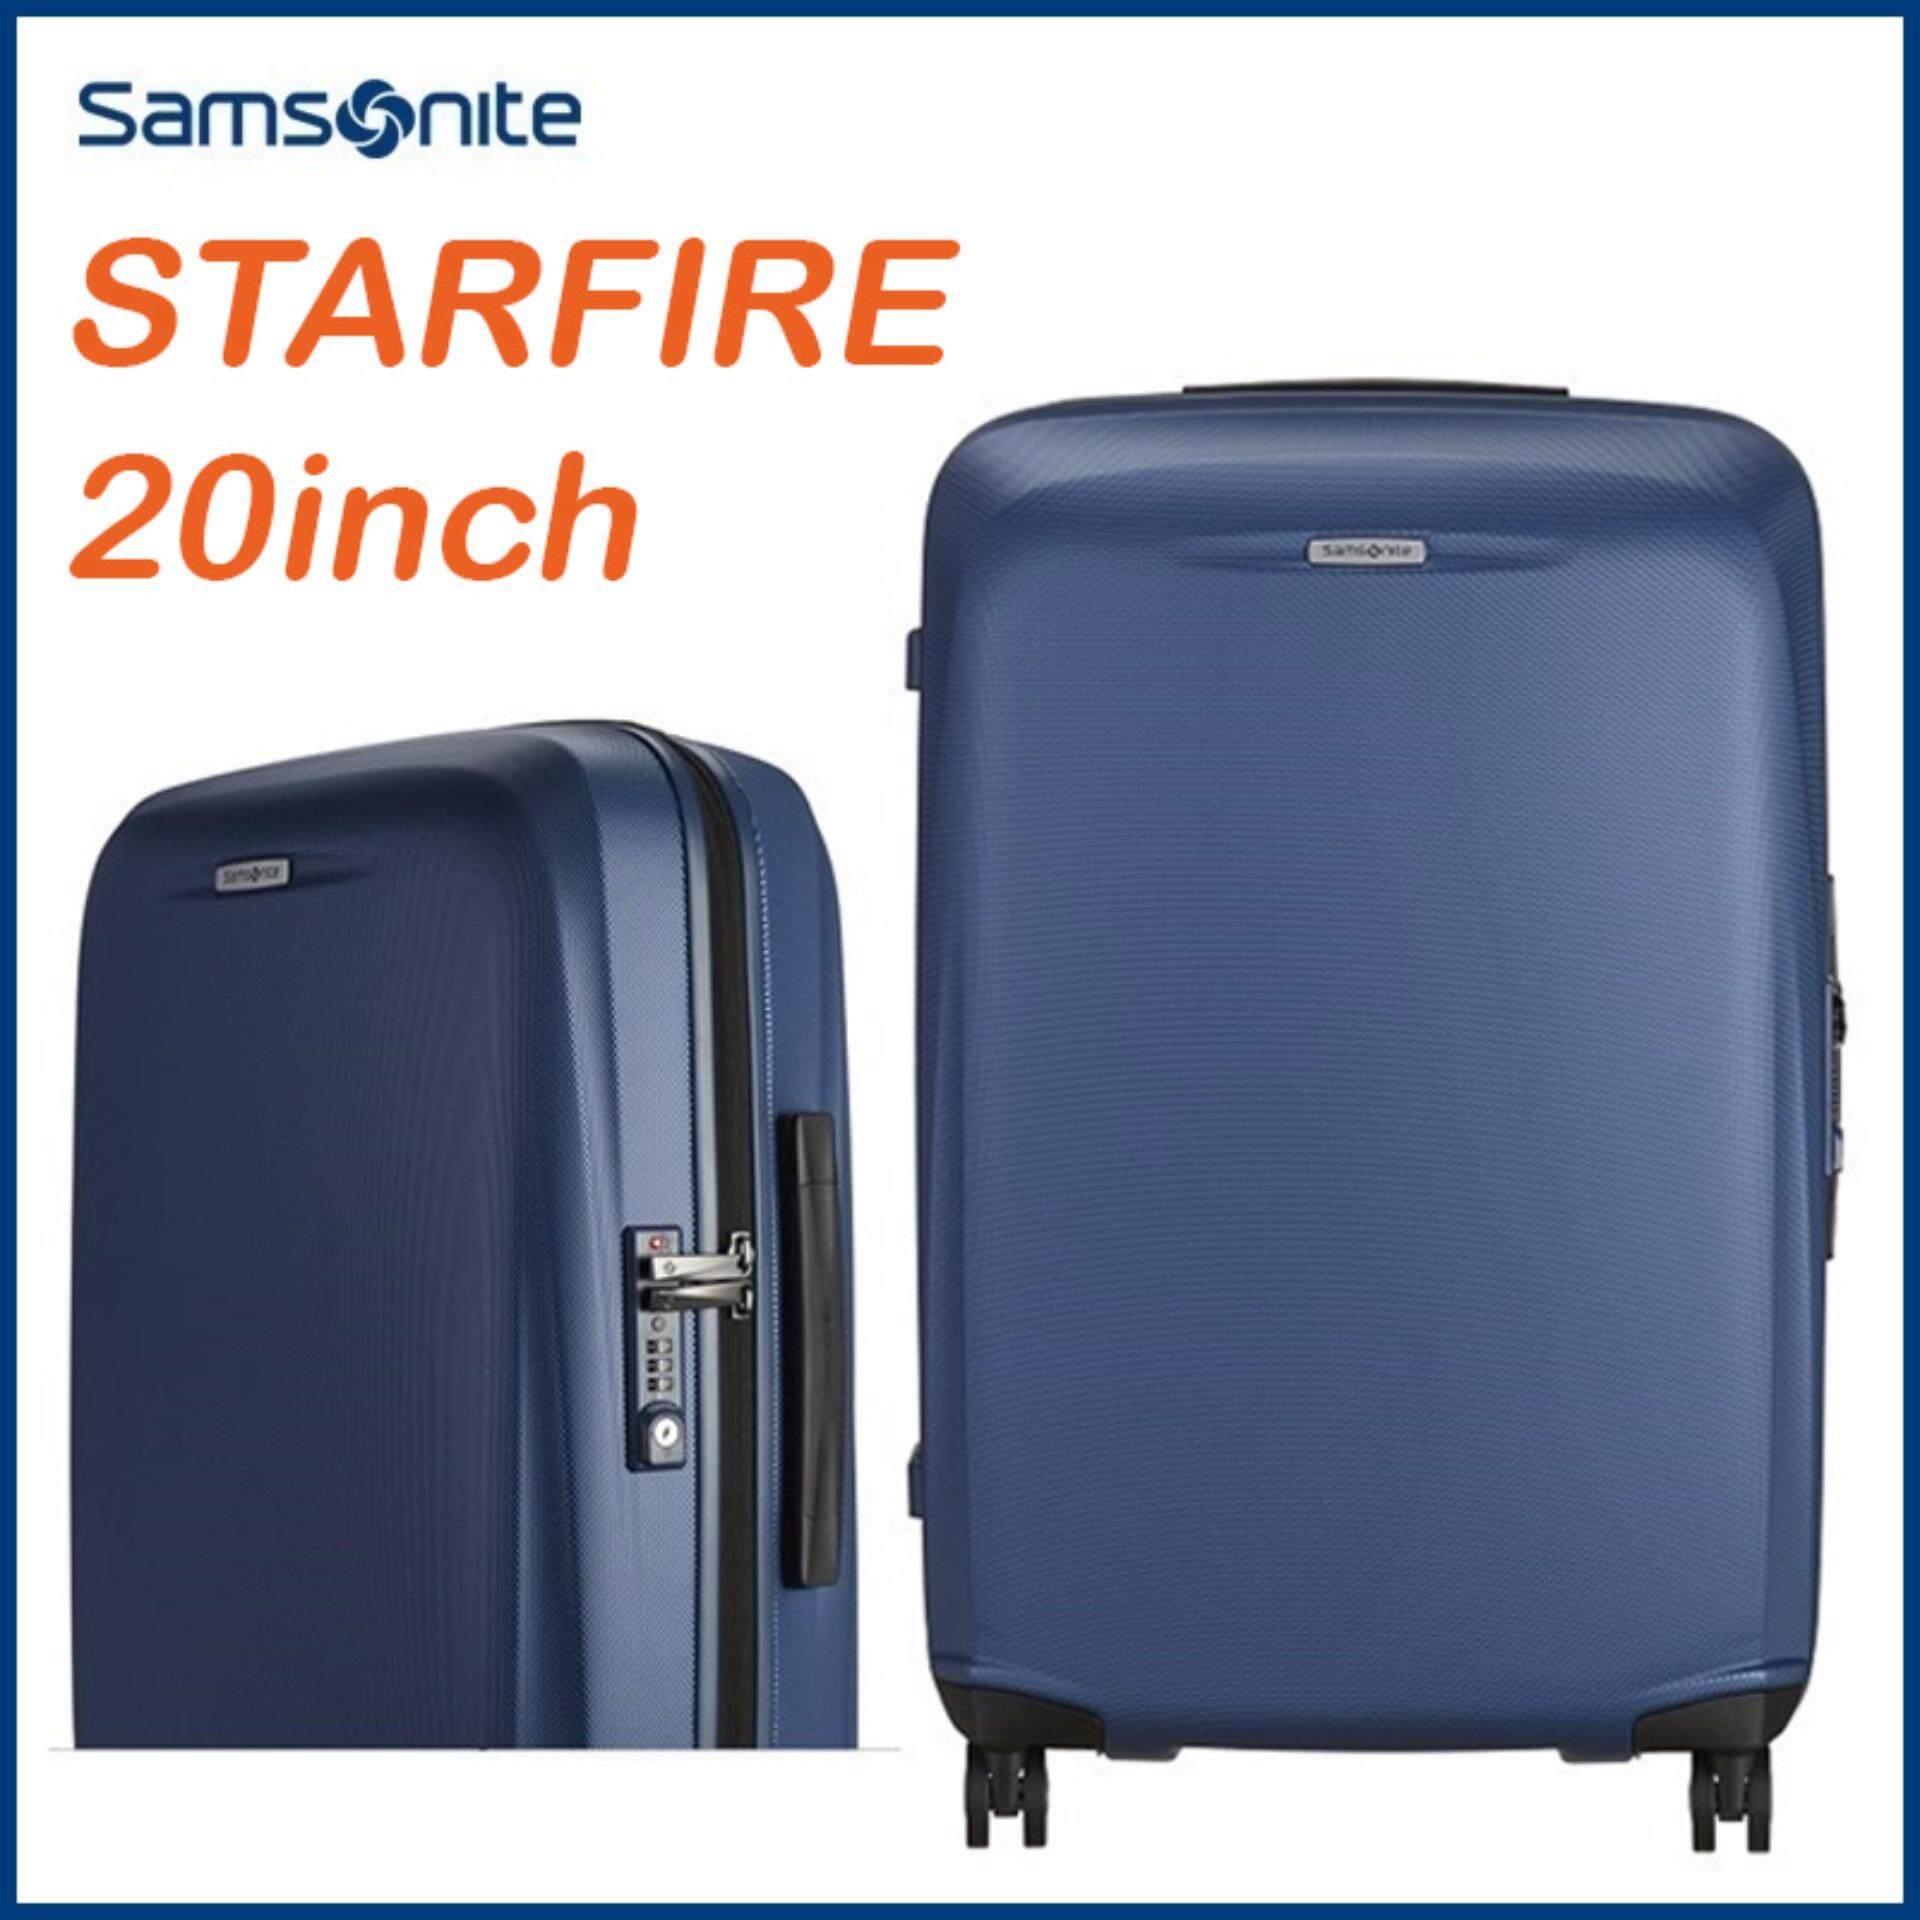 SAMSONITE STARFIRE 83D01001 Travel Carrier Luggage SuitCase 20 inch - intl